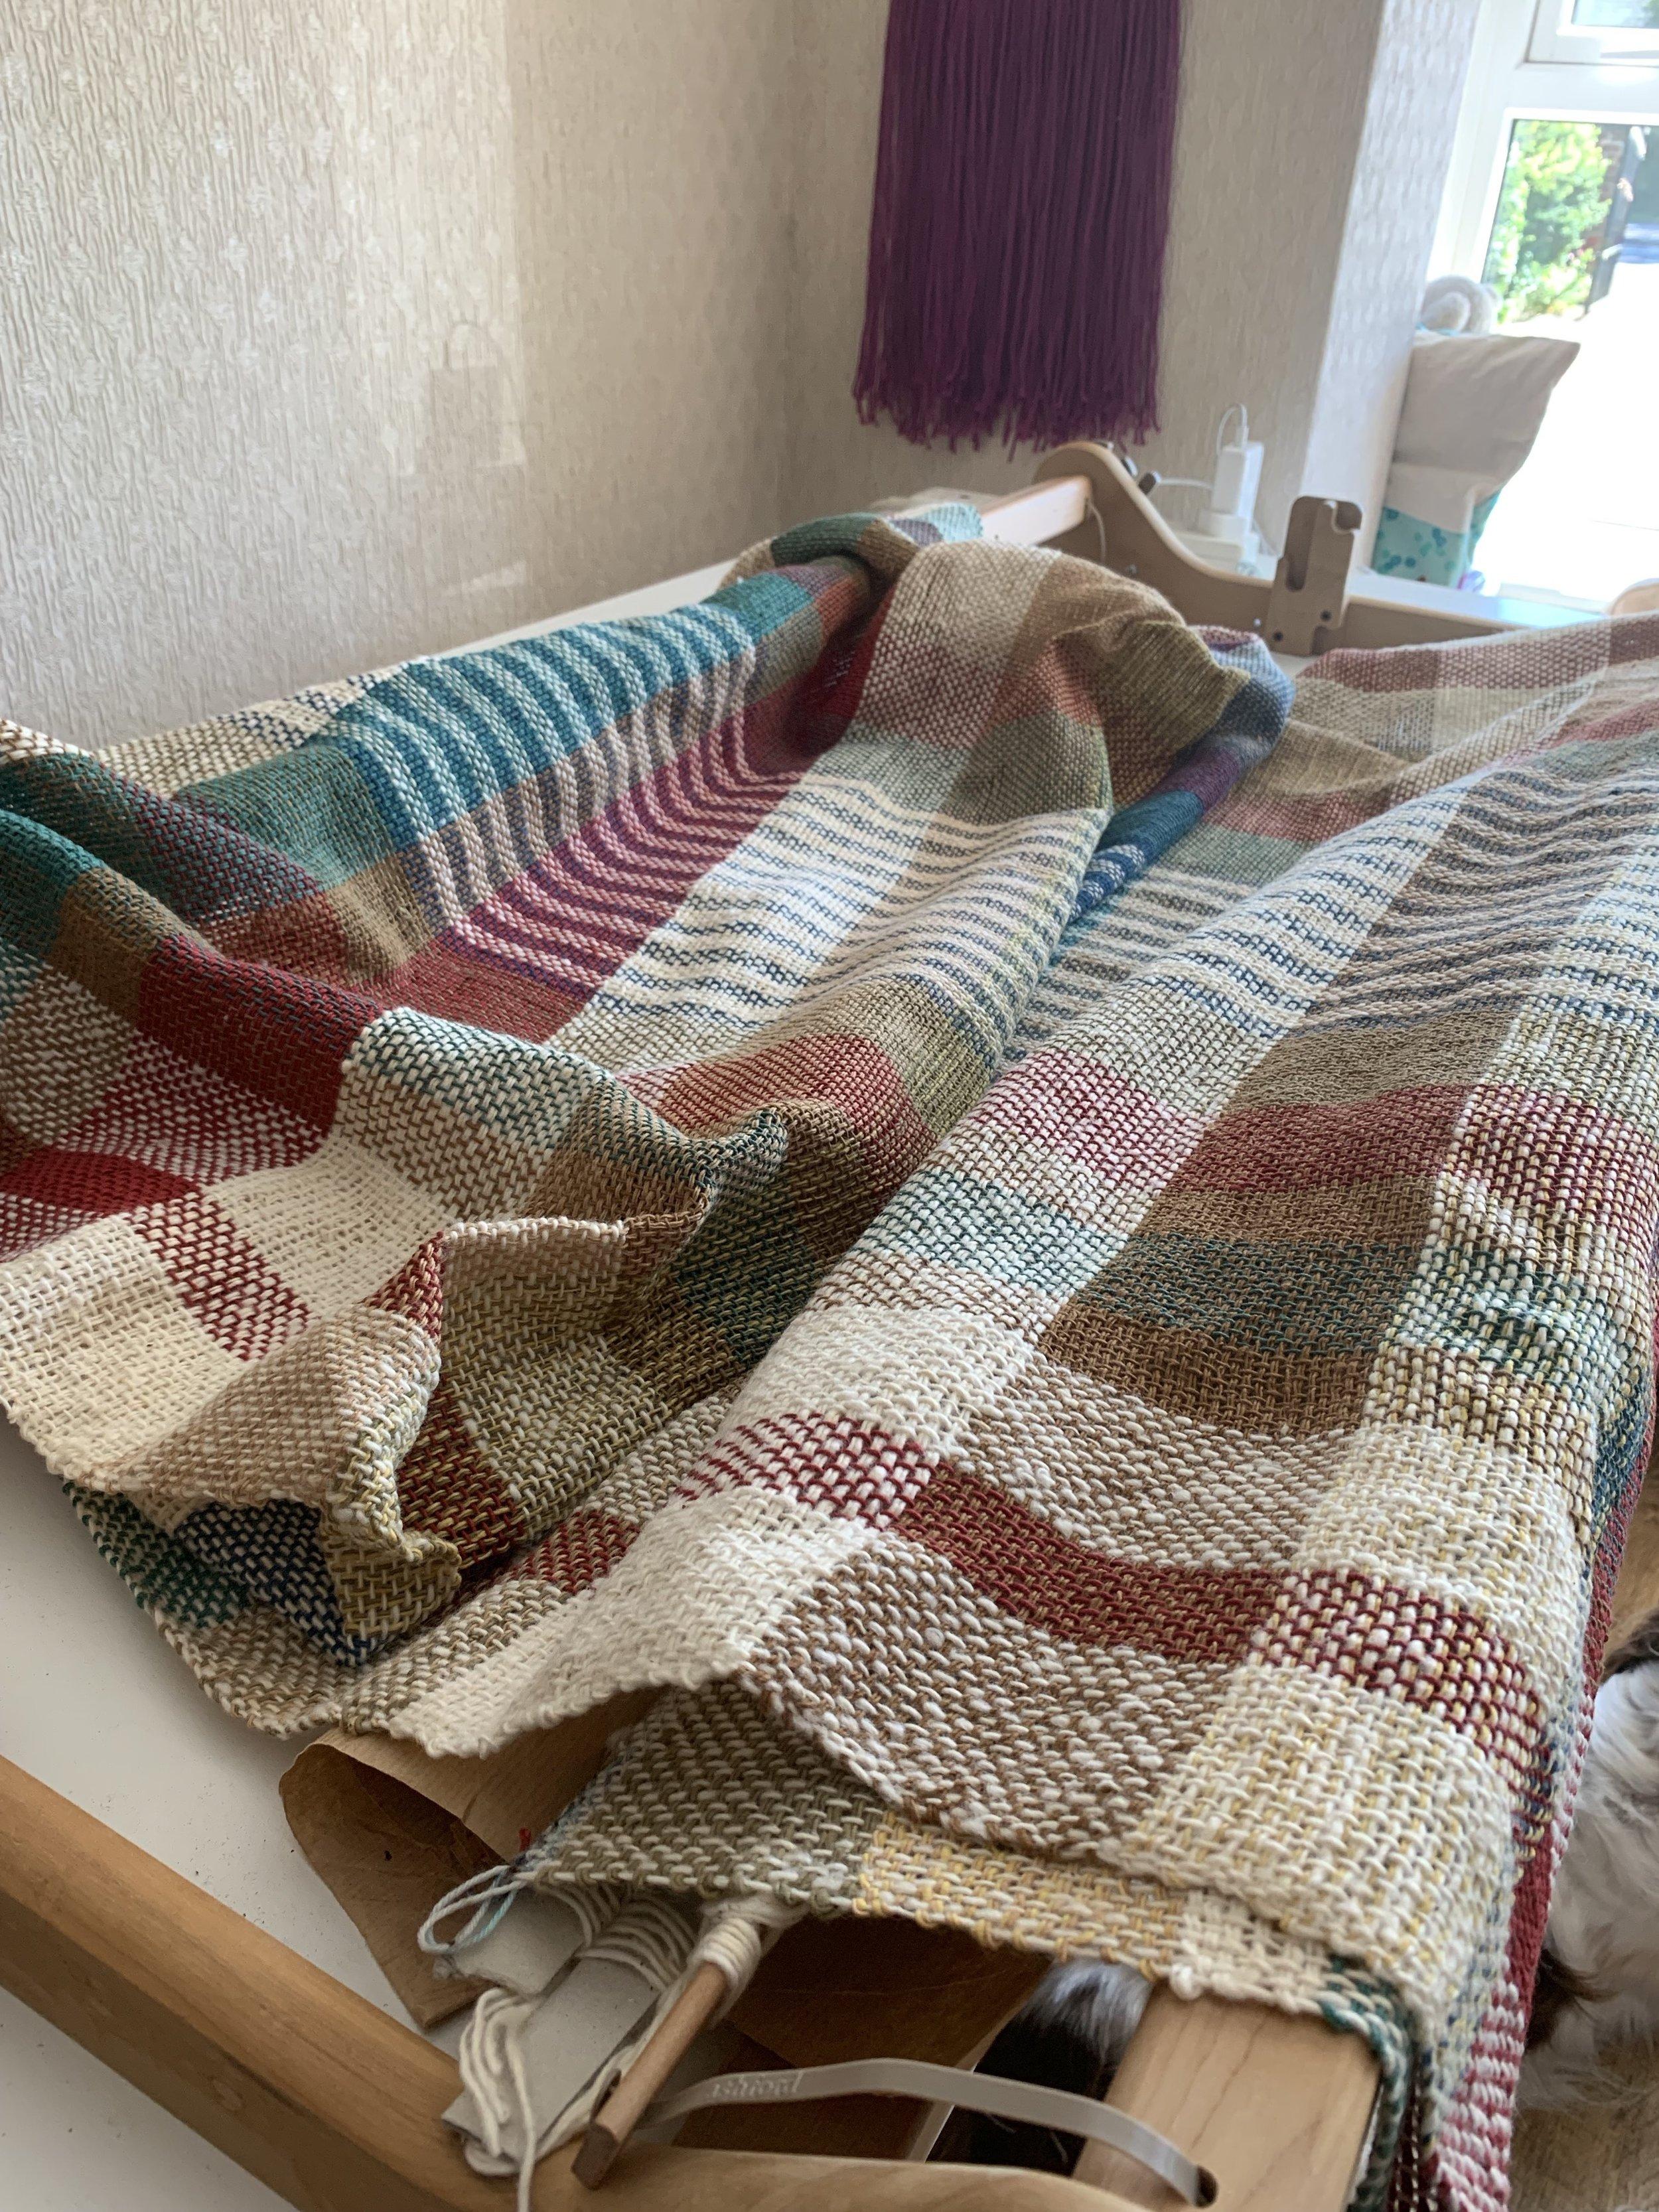 I love the effect produced by the slightly slubby cotton yarn in Hazel's blanket.